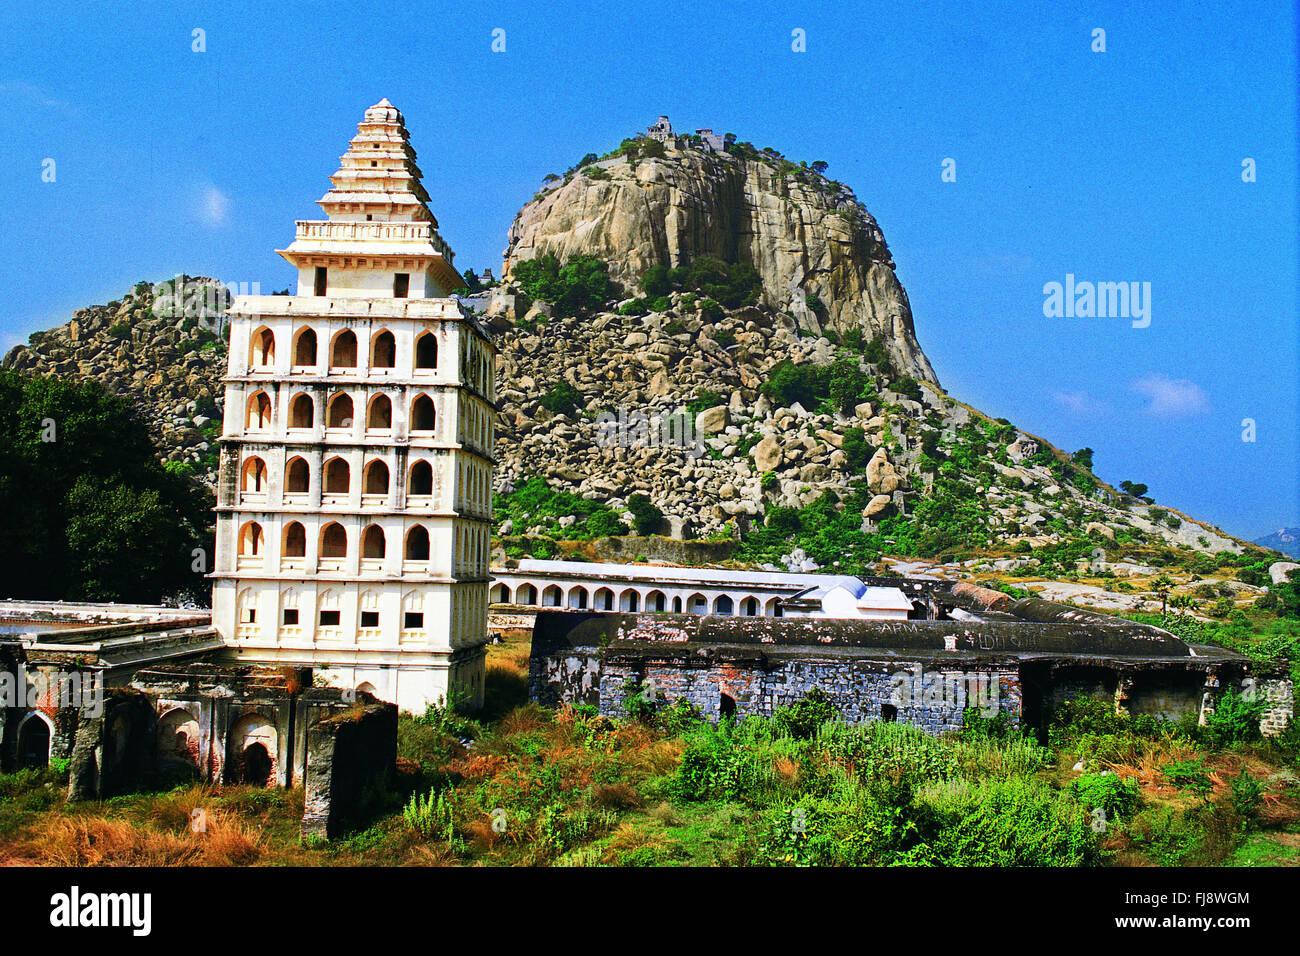 Gingee fort, tiruvannamalai, tamilnadu, india, asia - Stock Image